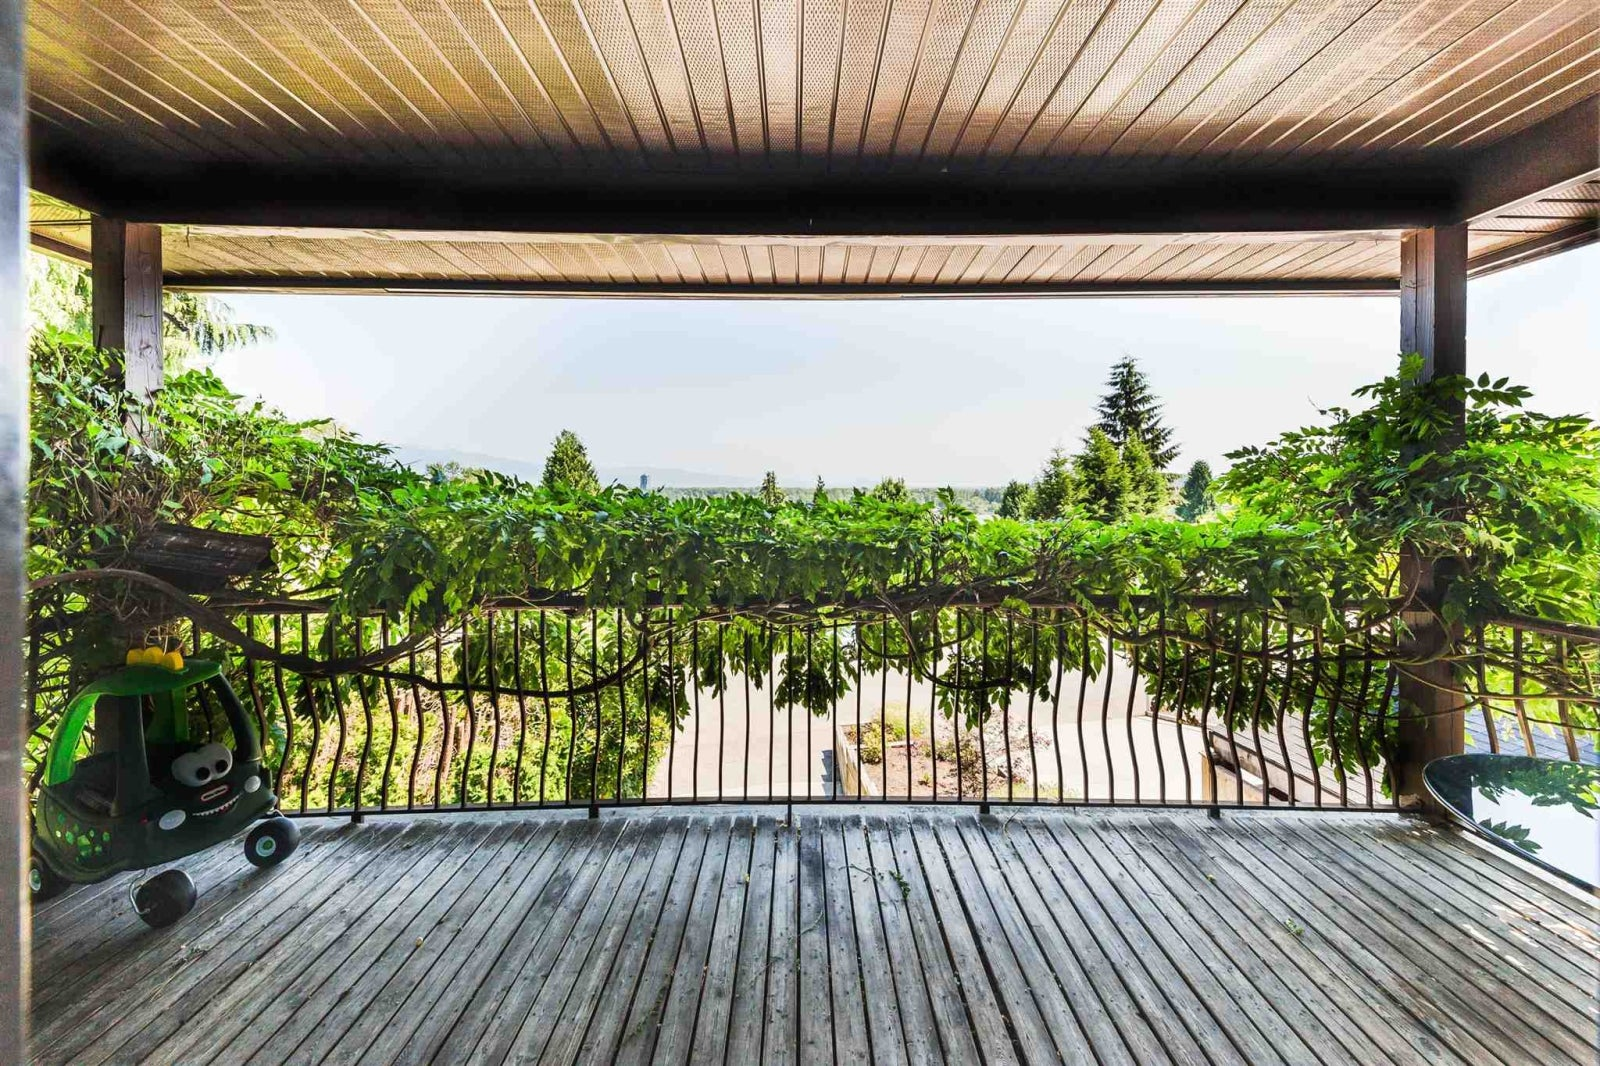 843 REDDINGTON COURT - Ranch Park House/Single Family for sale, 5 Bedrooms (R2602360) #27